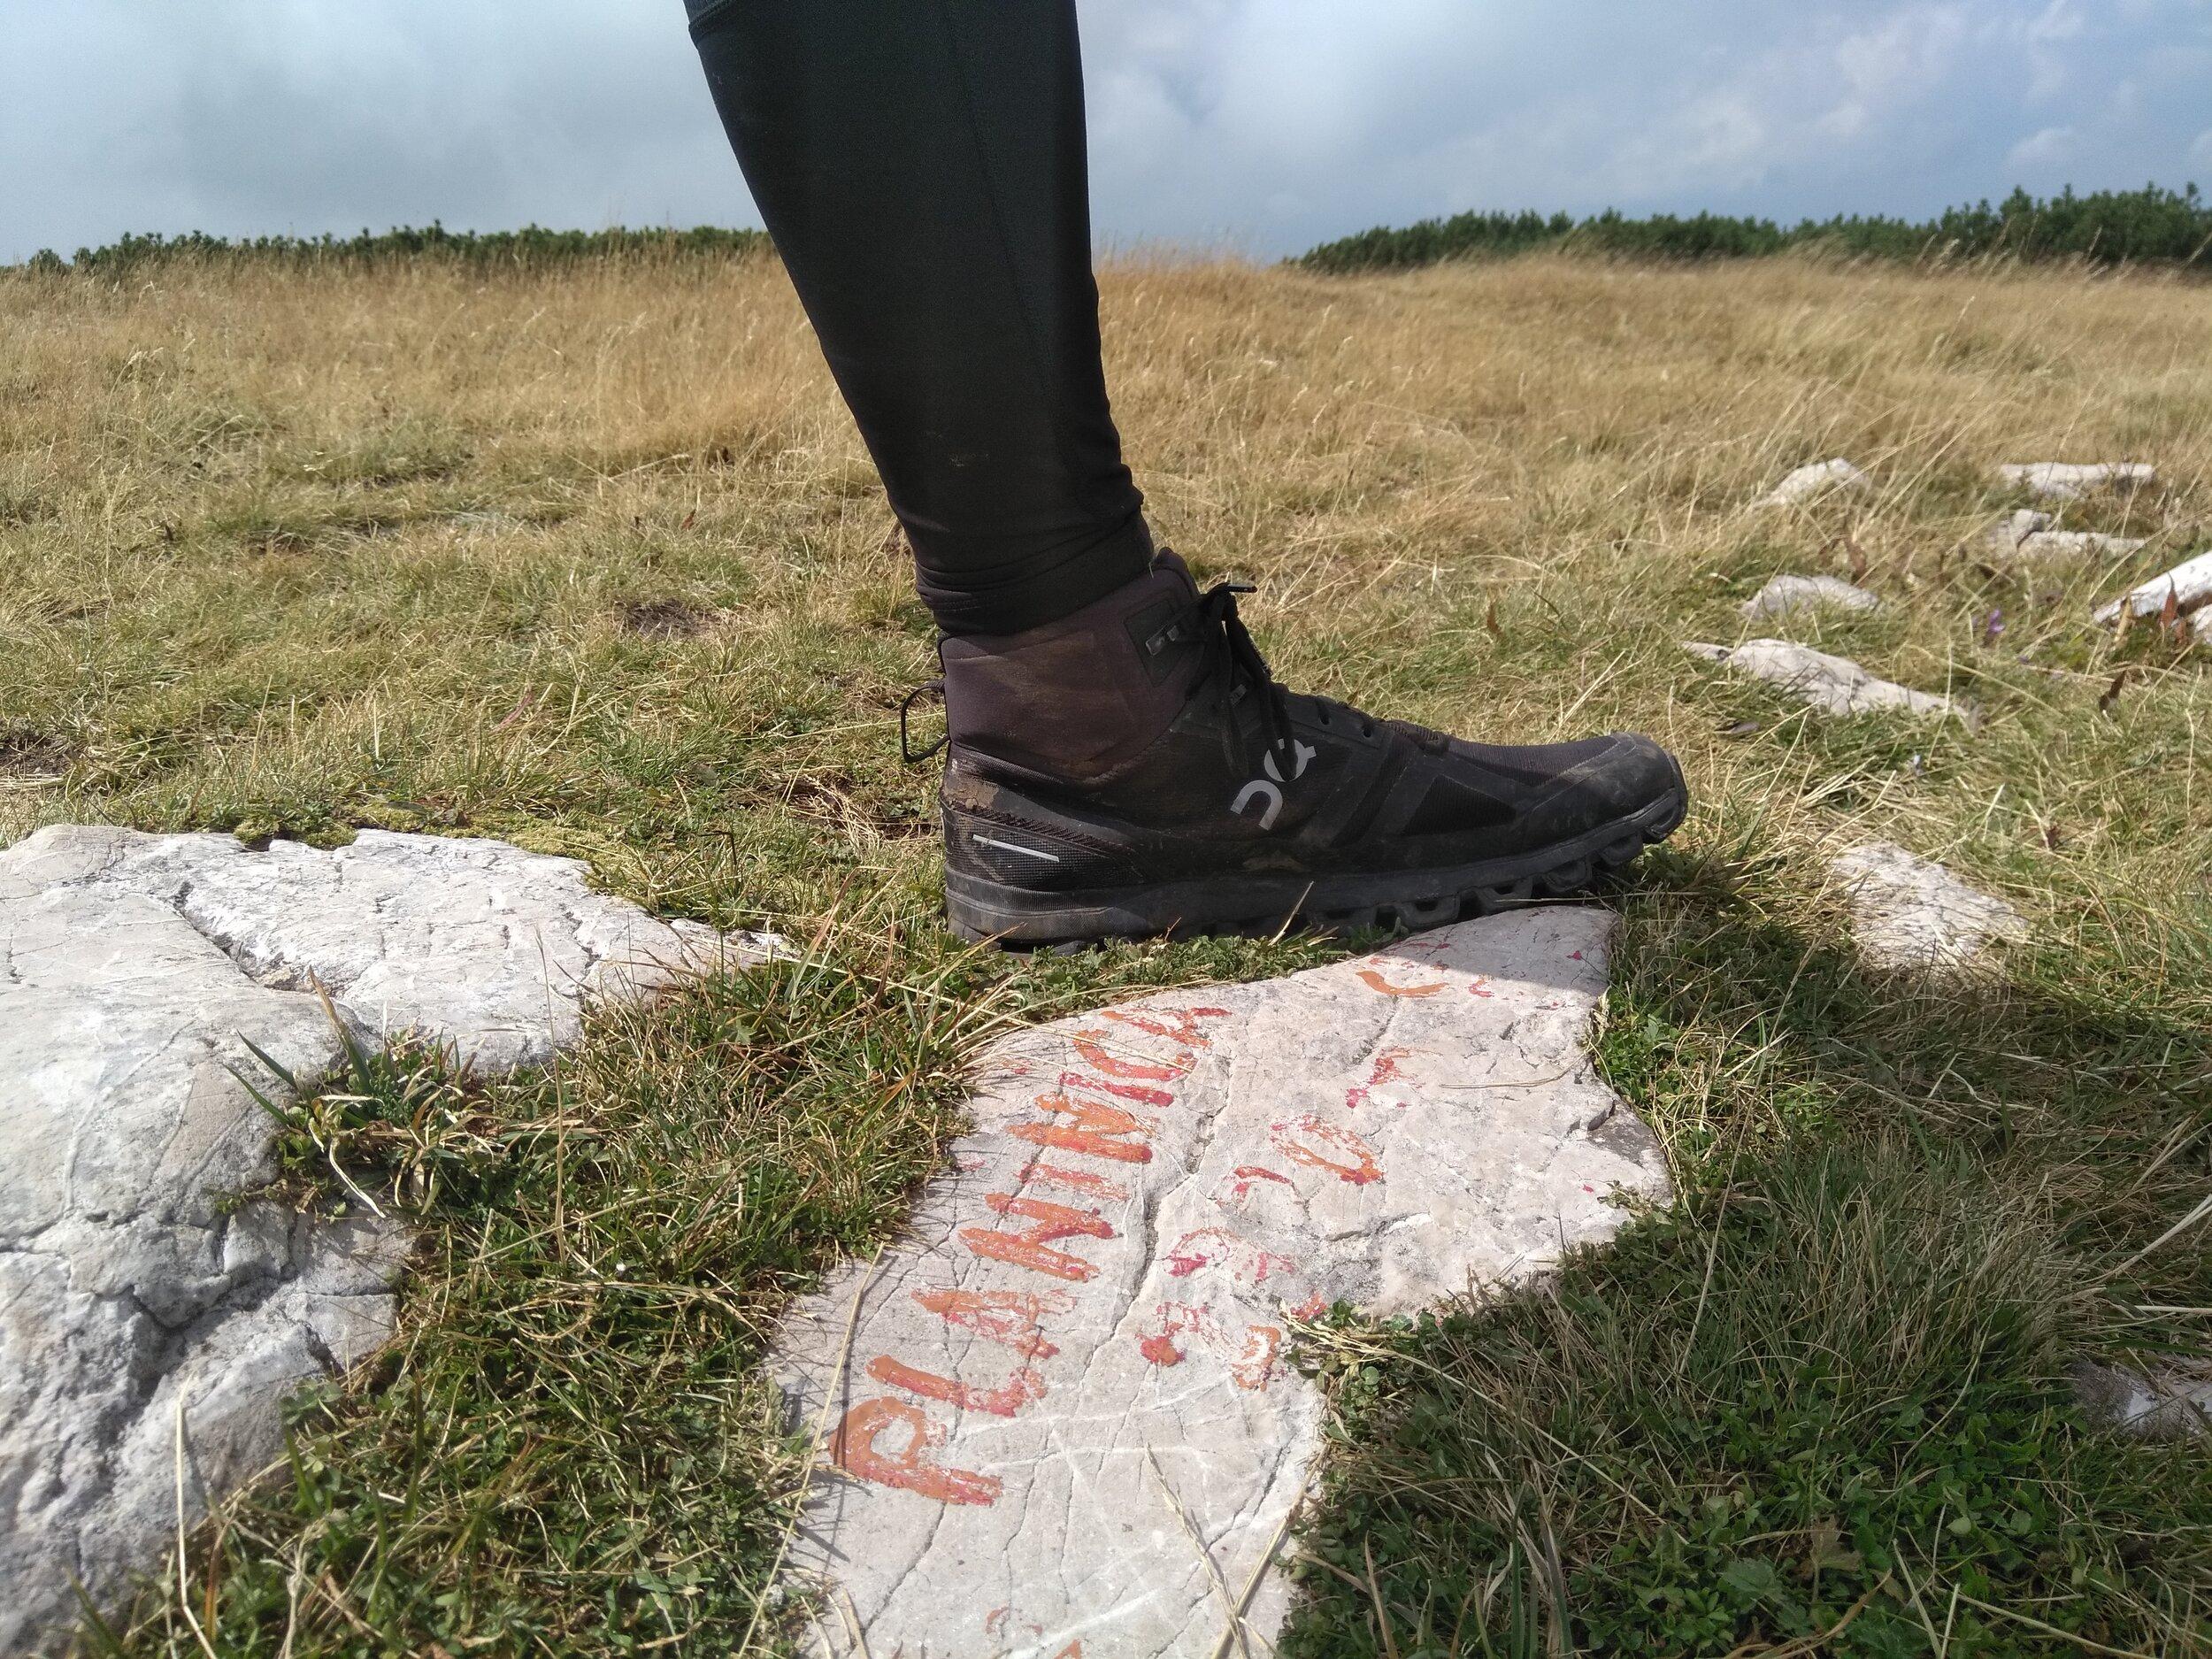 On Cloudrock waterproof boots